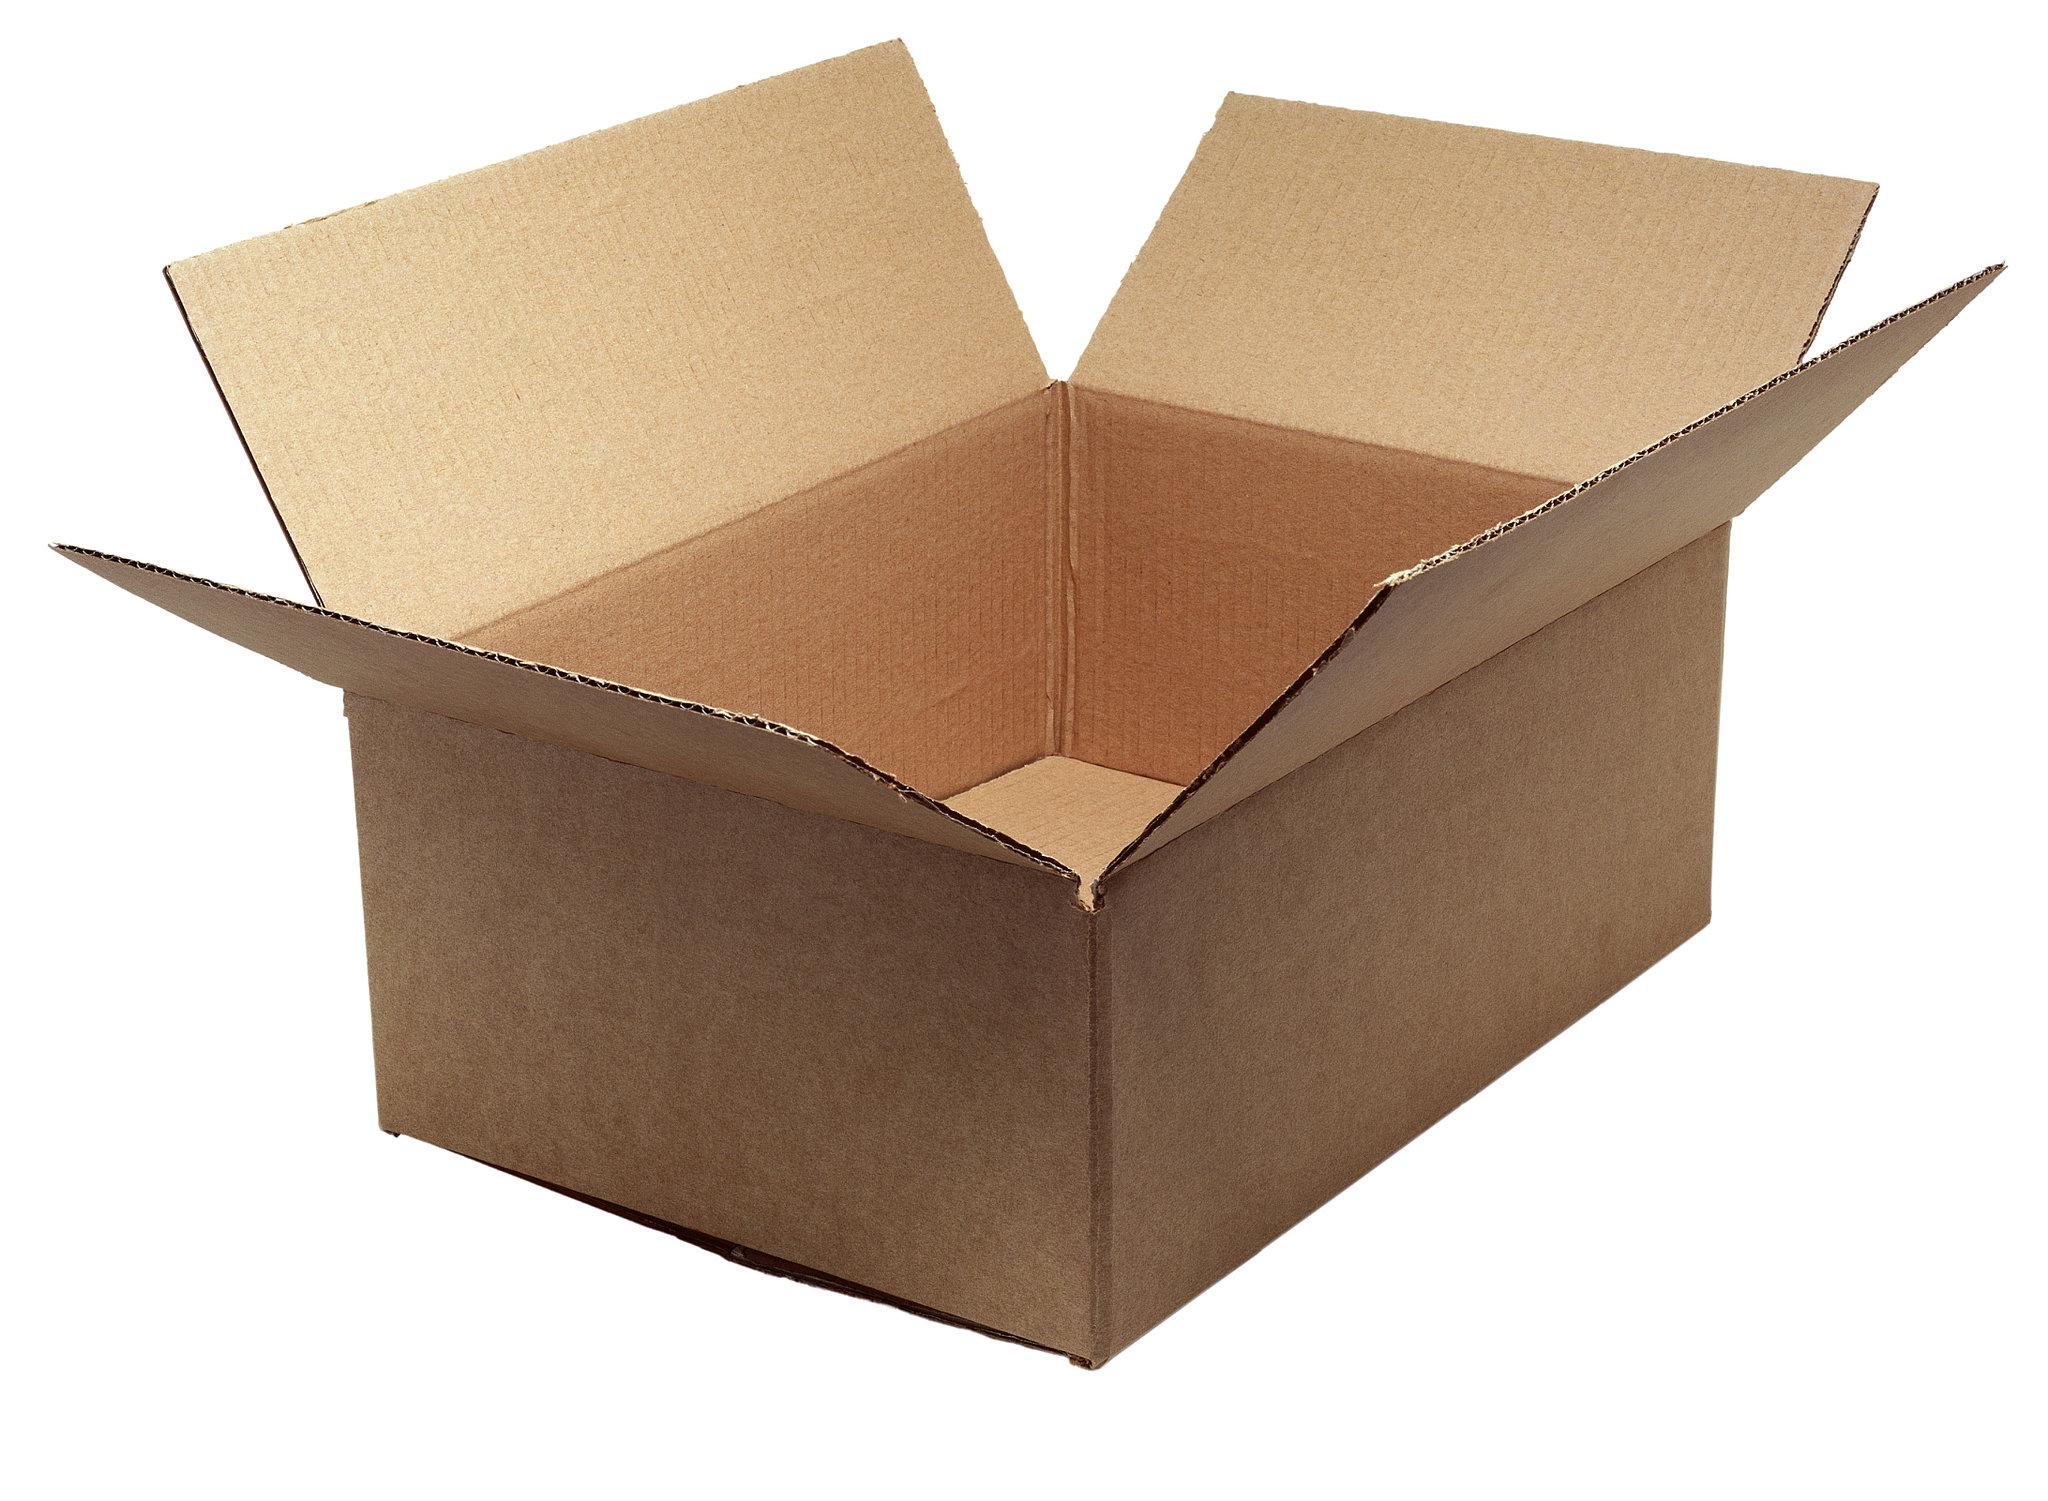 Box photo